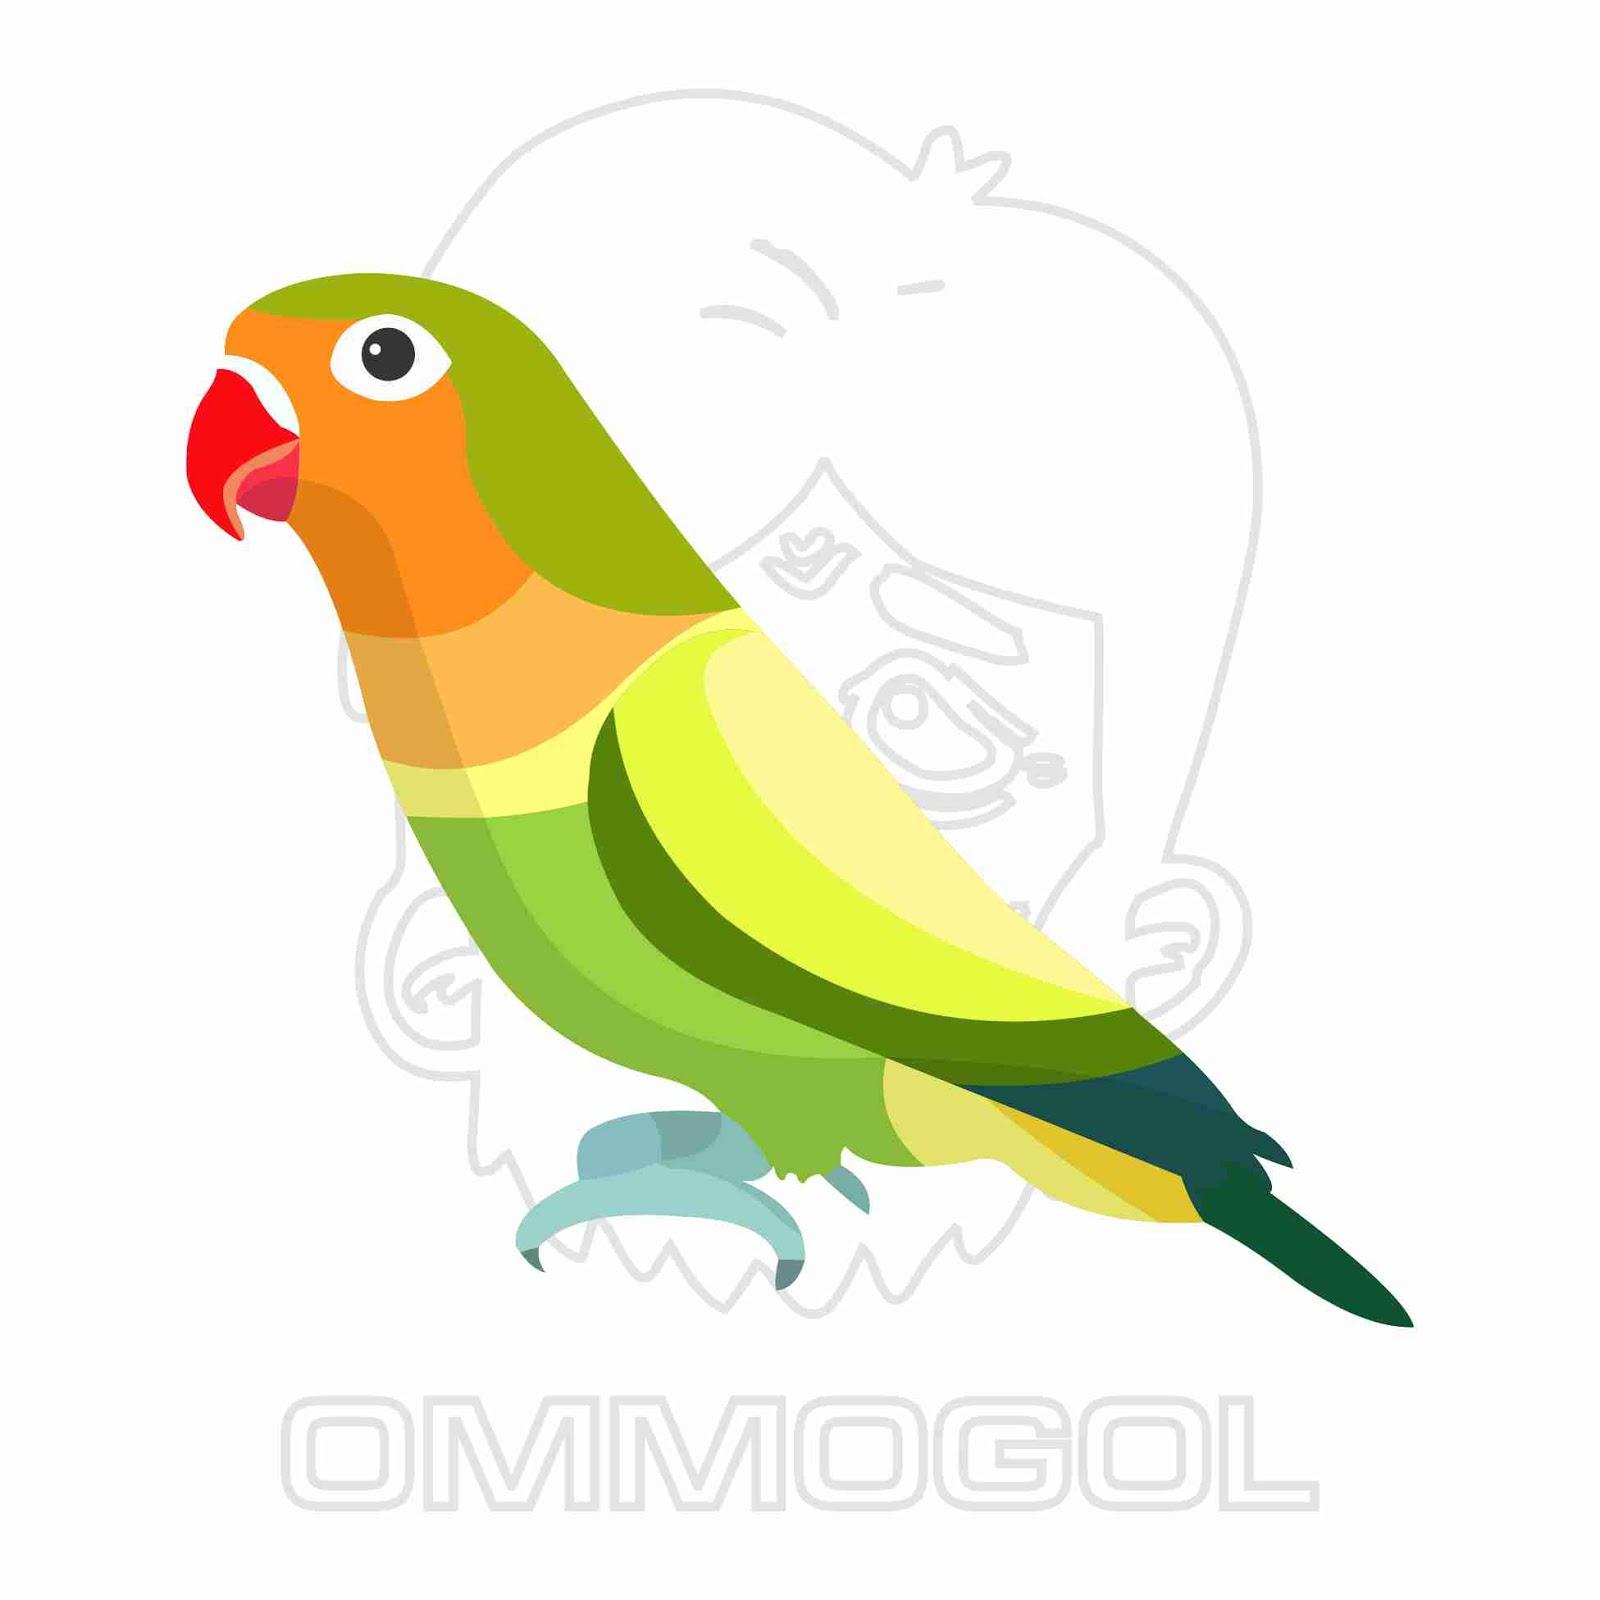 Unduh 99 Gambar Burung Vektor Keren Gratis